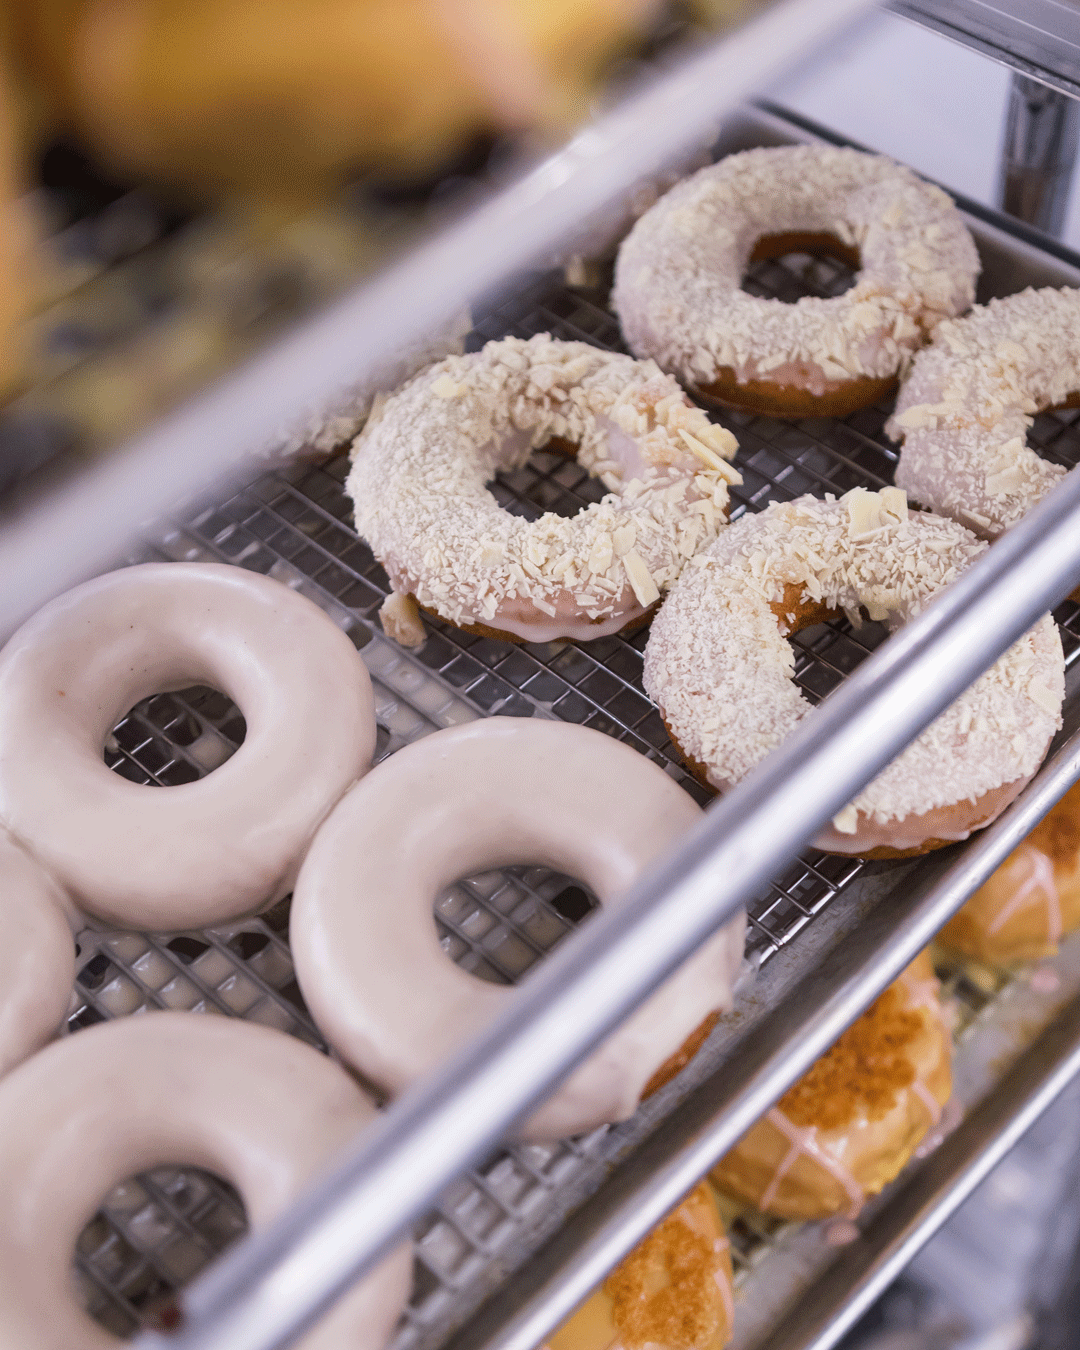 How A Vivid Dream Created A Local Donut Empire: Cartems Donuterie - RESTAURANT HIGHLIGHT